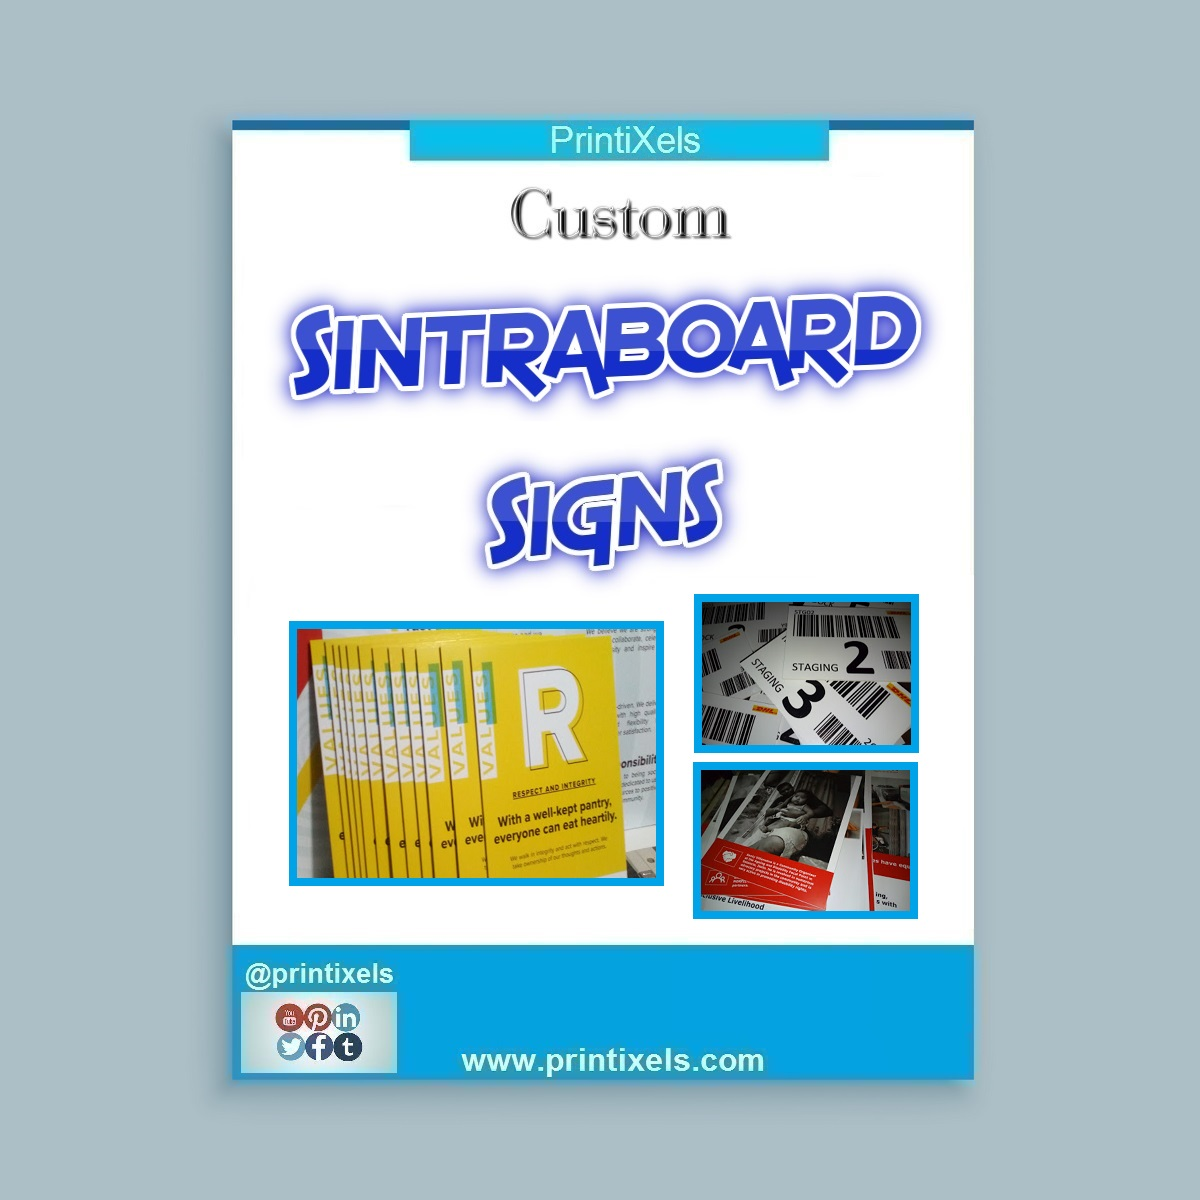 Sintraboard Signs, Custom Sintra Board Posters Philippines